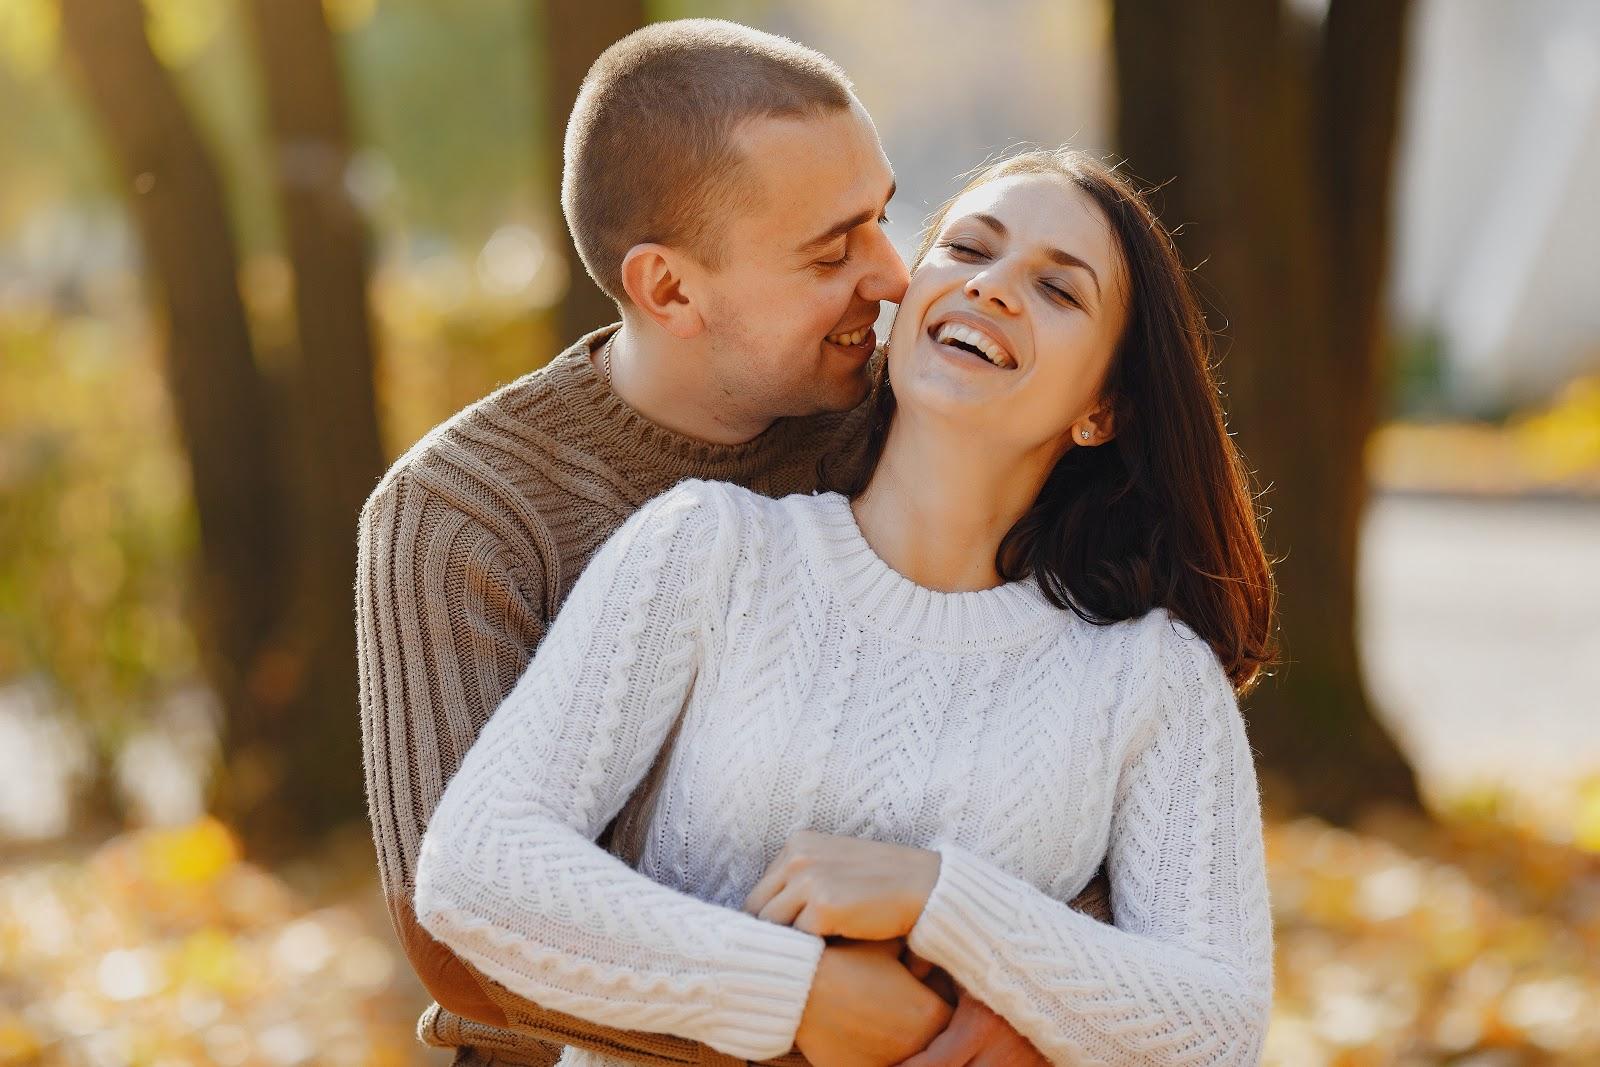 3v8yKdKZMLCnMcfF8lNNCpP4wLToqYT1GilOGDR5Jh6iBYUYMqBXSsGgsnHaZ4YmmMUKHllgngY5HQFOqZe4azWFO7L0axE0ELmIem9pcih laG2E9V2Vs4xZD4Bk0l46vF1aaUo - 5 Things A Man Will Only Do If He LOVES You Authentically